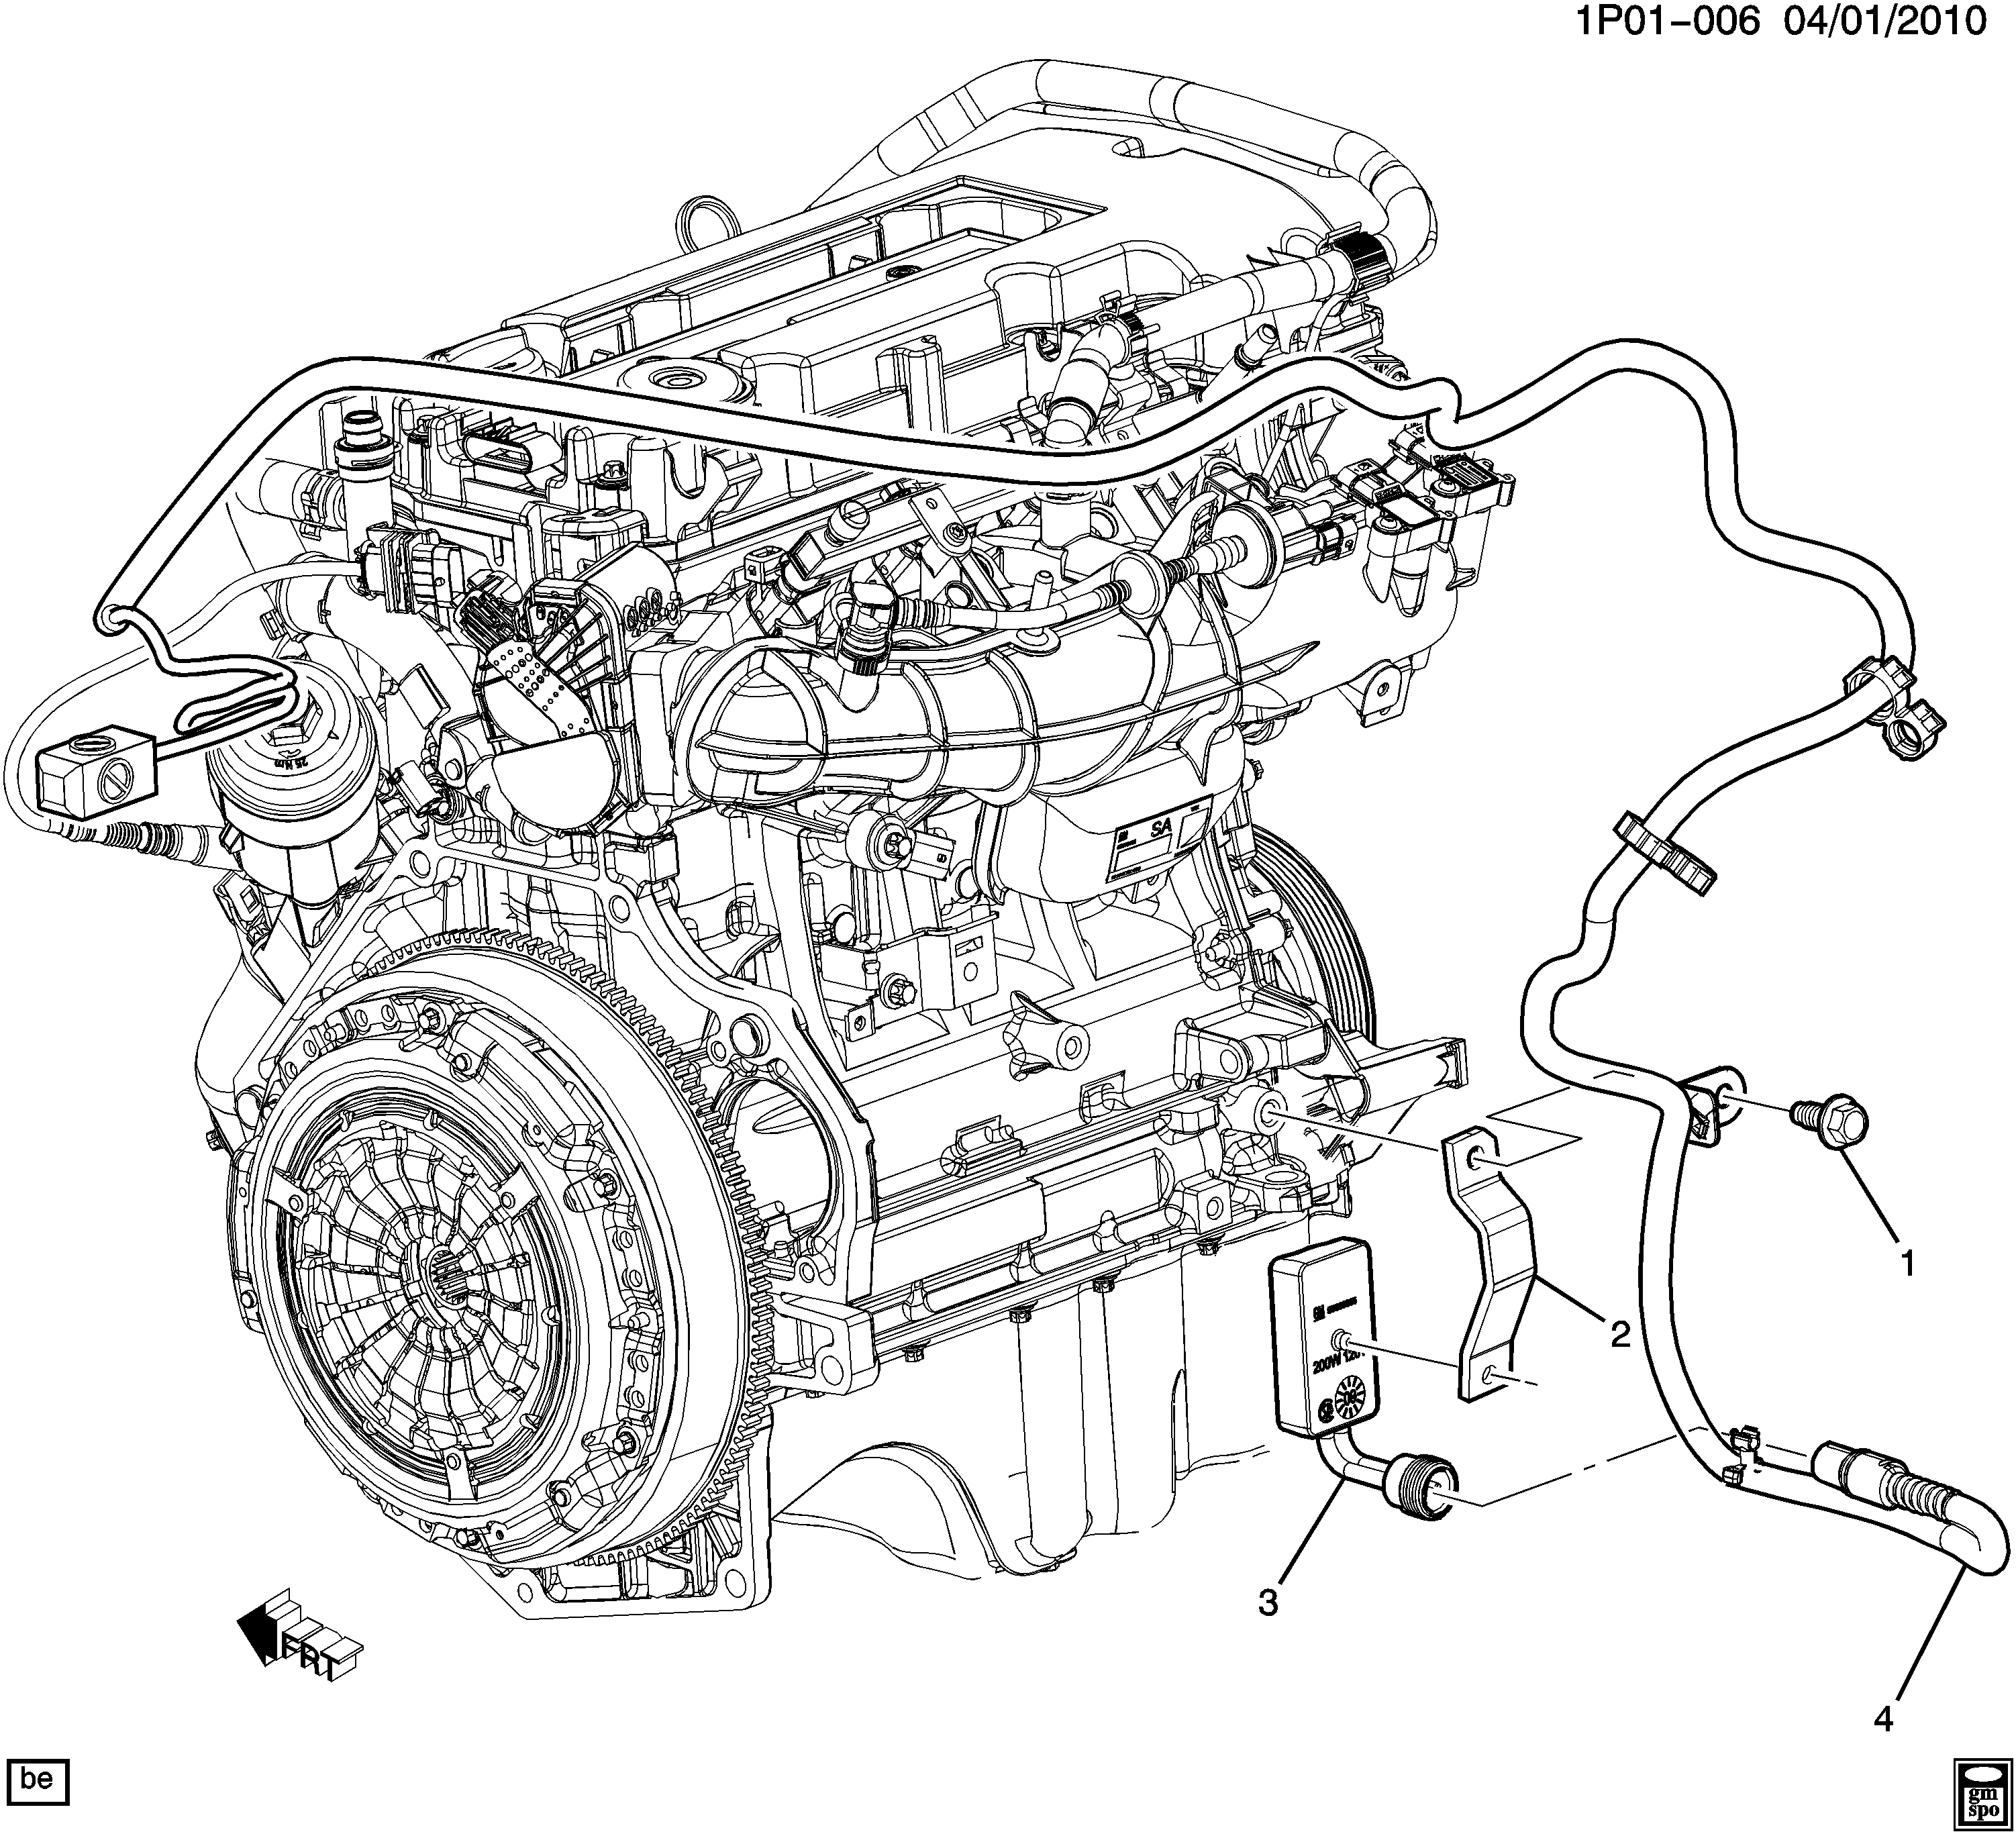 Buick Encore  1 4b  Mh8